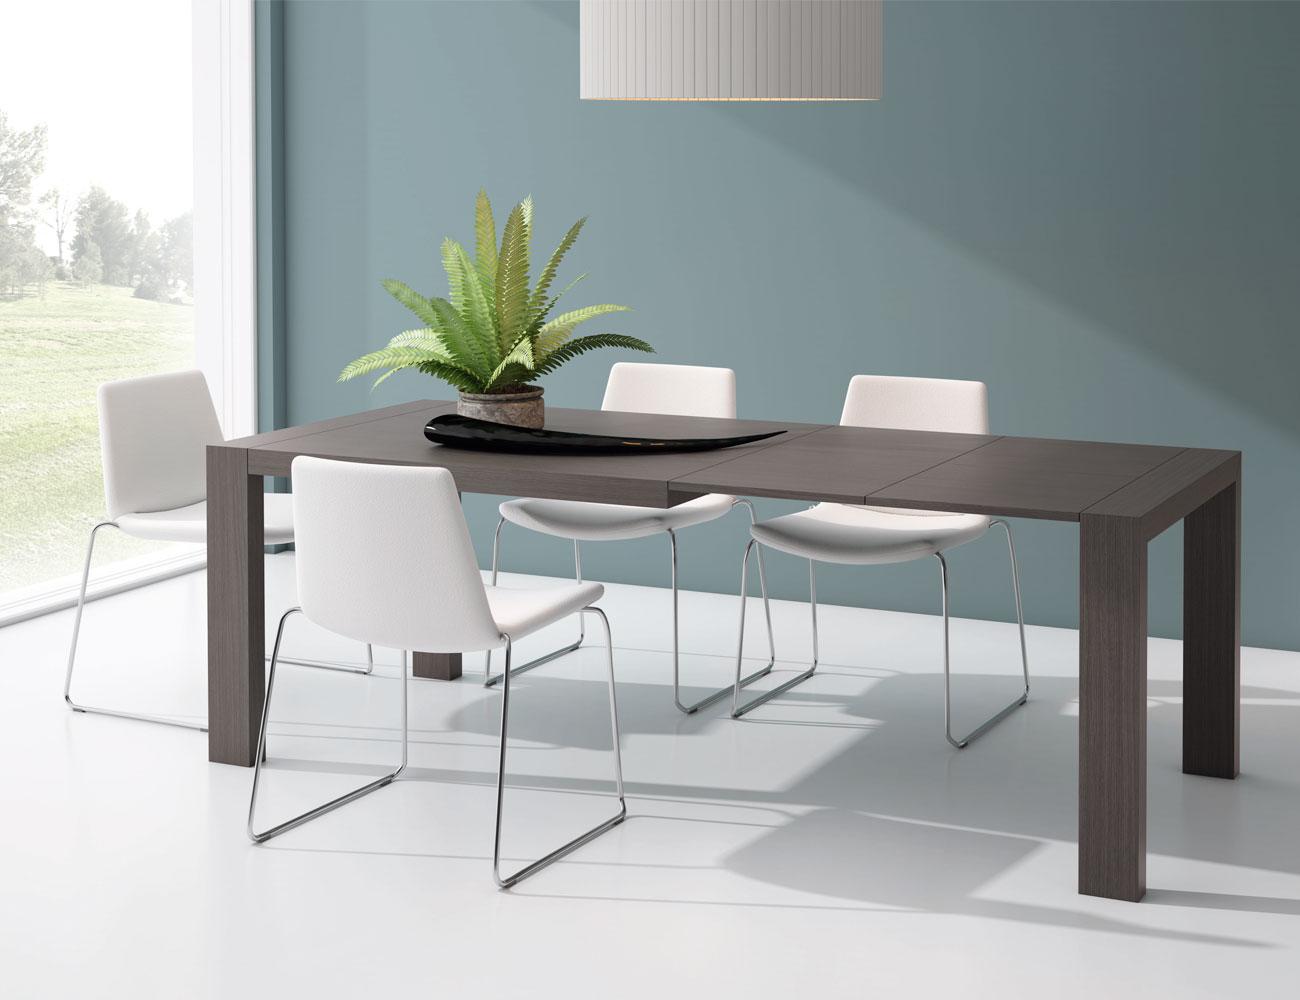 M223 mesa comedor rectangular extensible abierta ceniza16